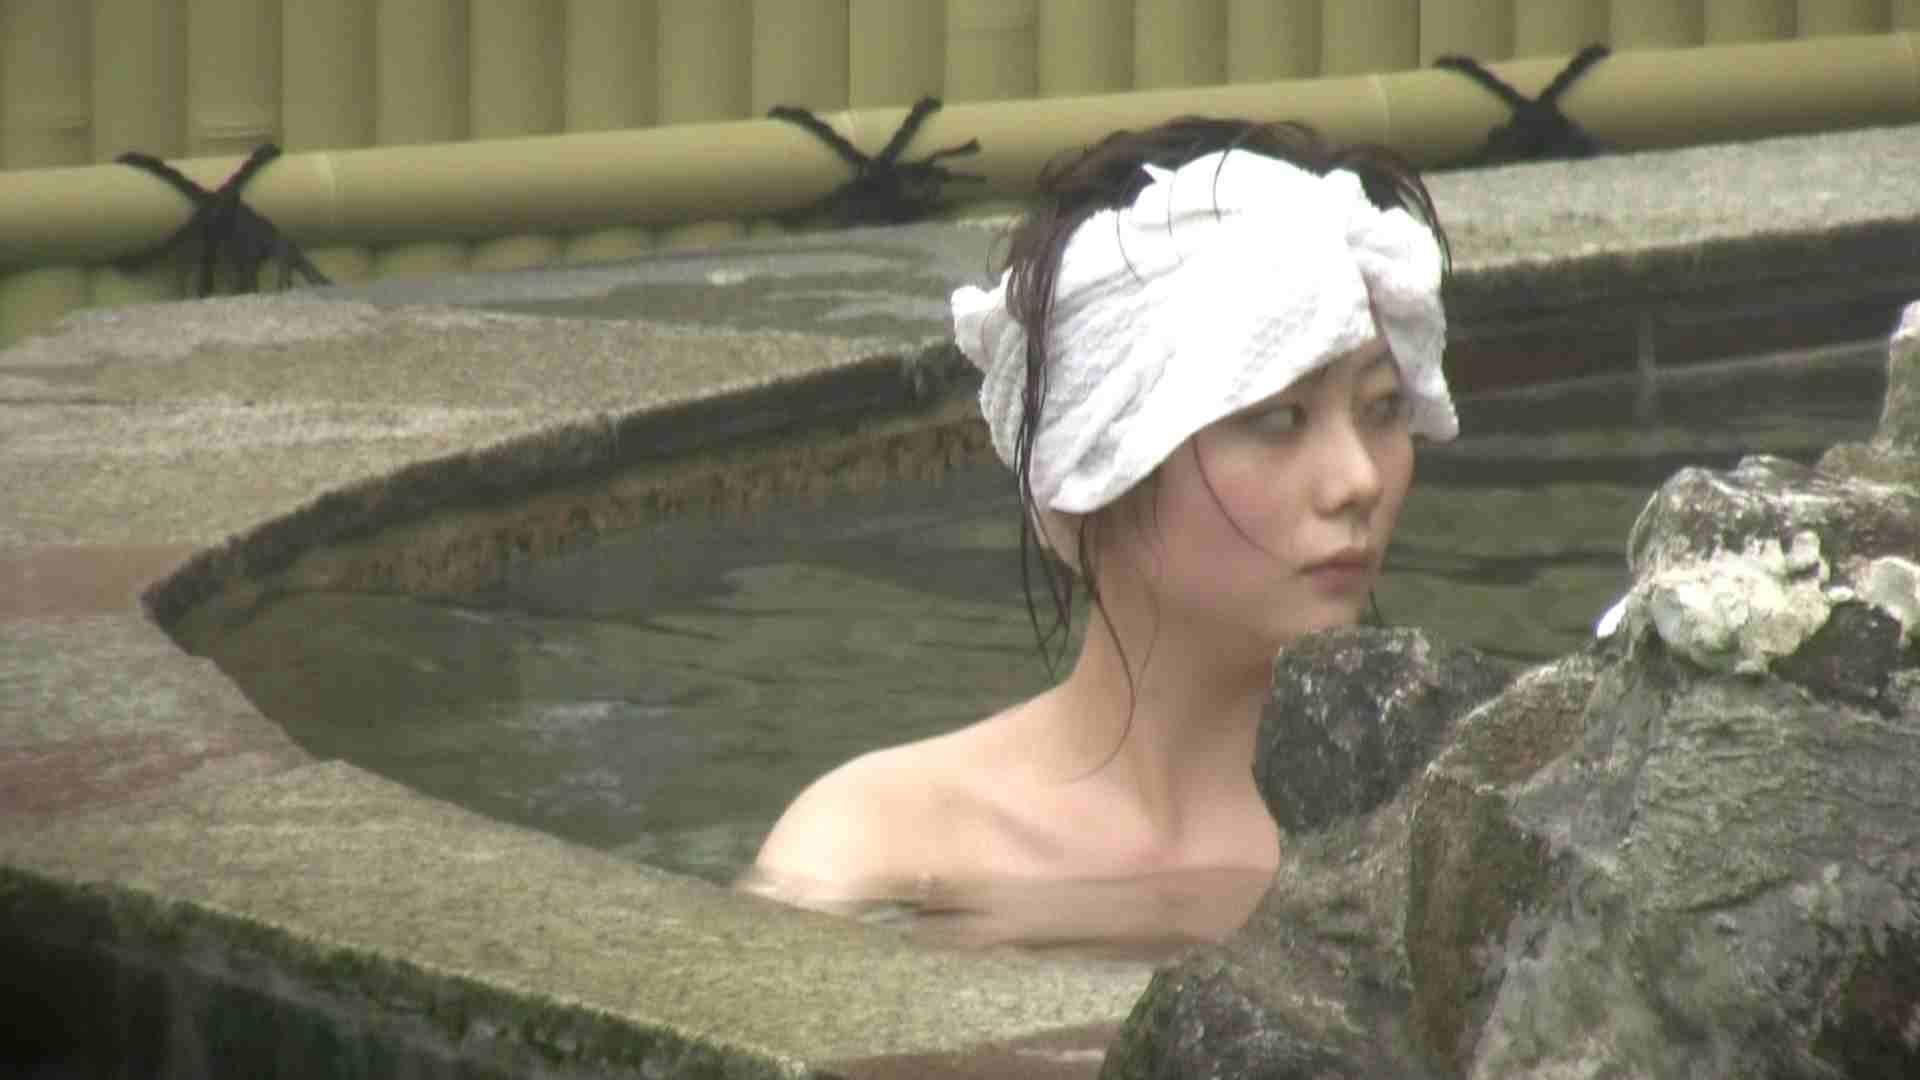 Aquaな露天風呂Vol.147 綺麗なOLたち アダルト動画キャプチャ 102枚 41